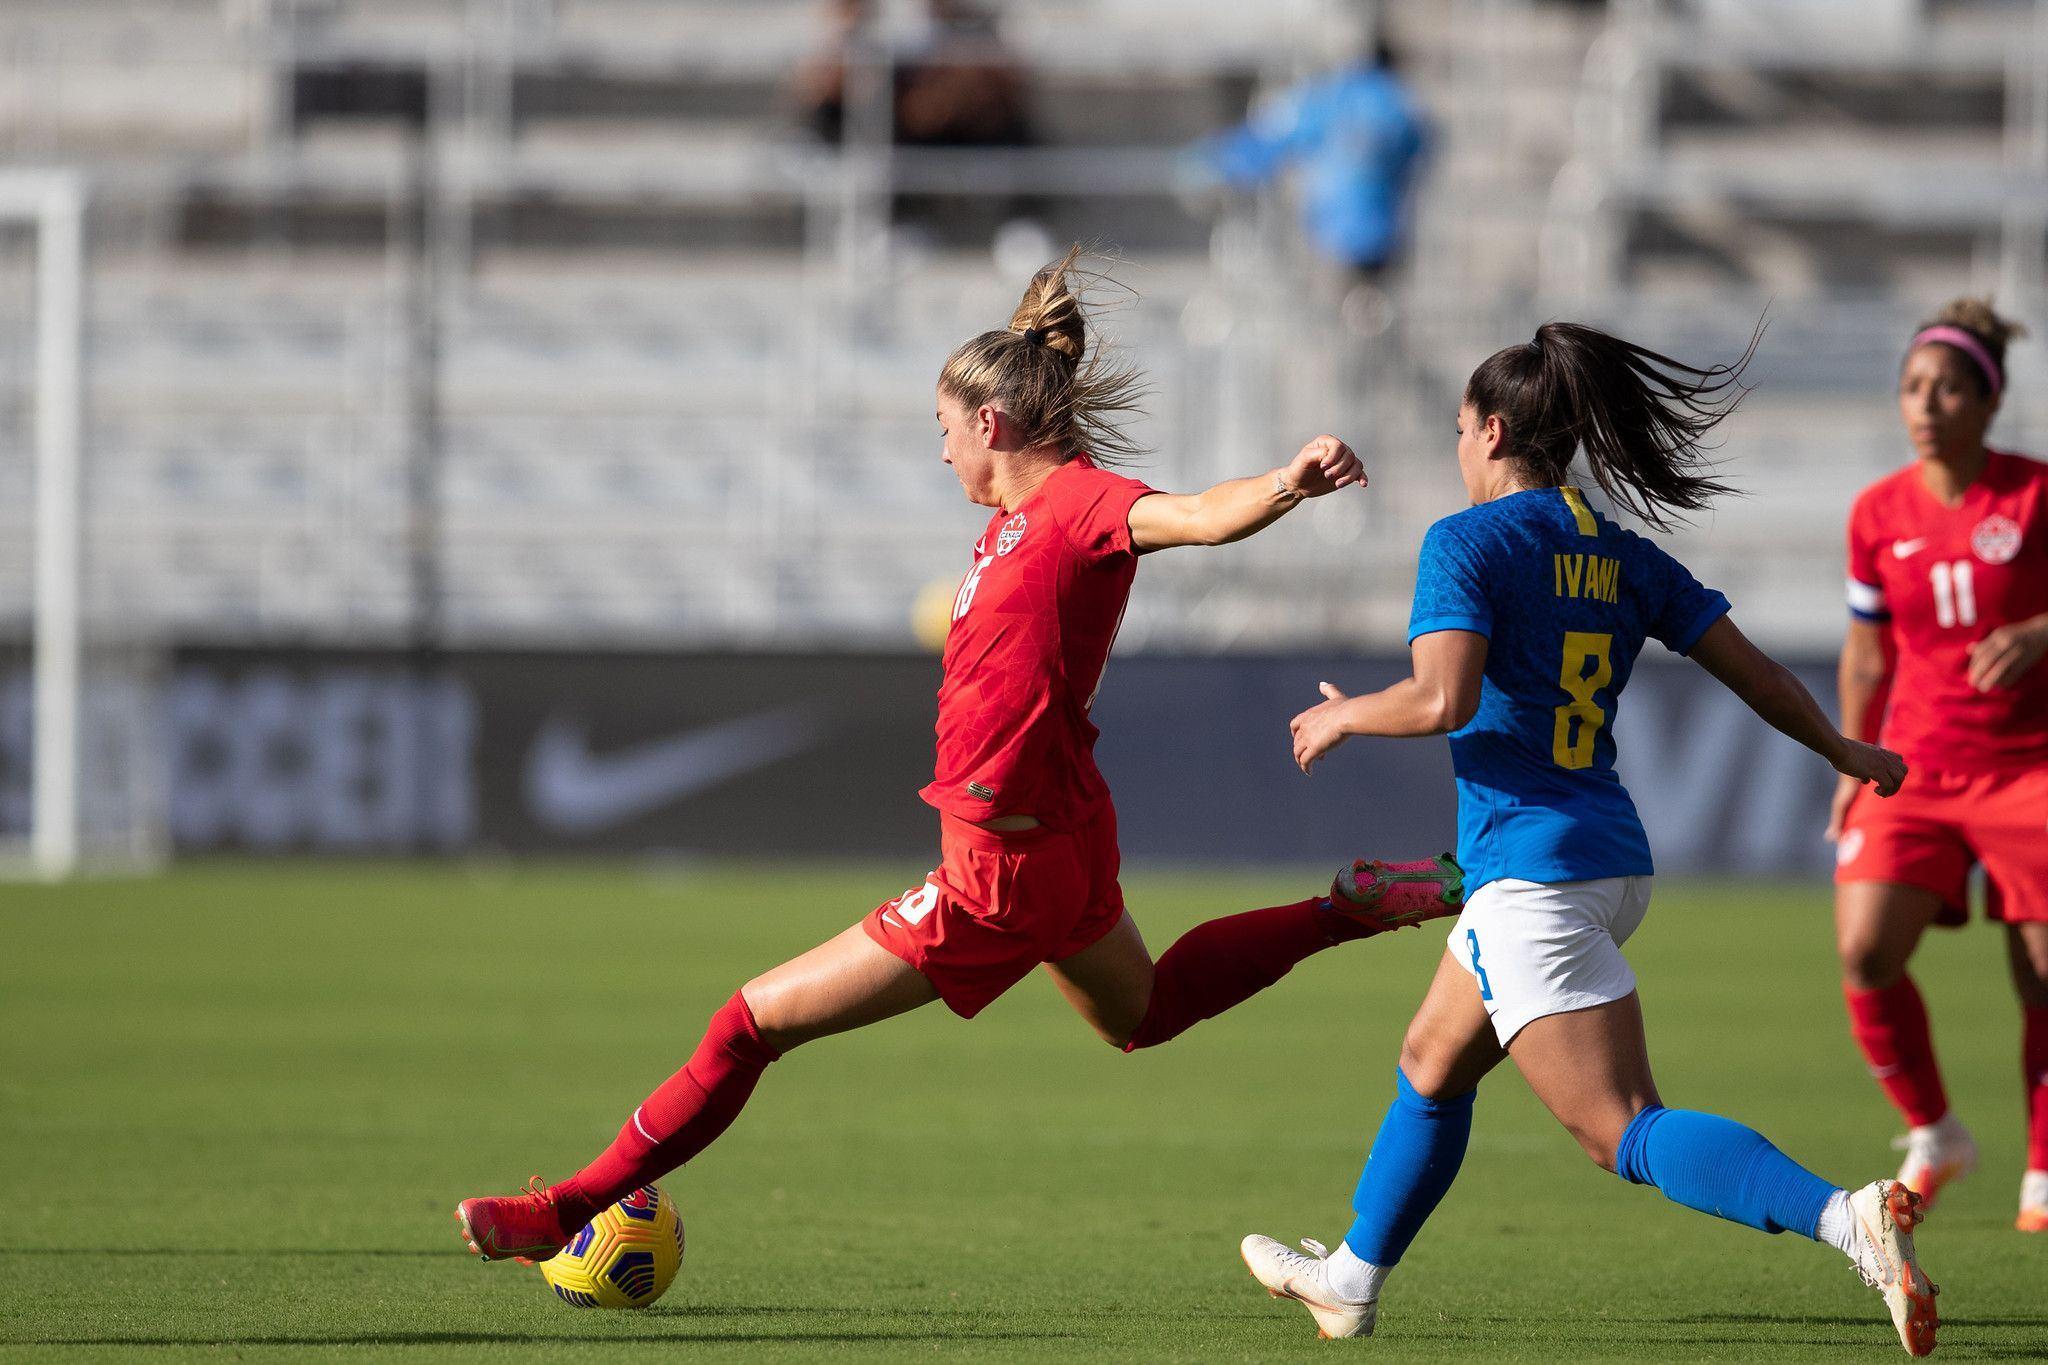 Credit Canada Soccer / Jeremy Reper